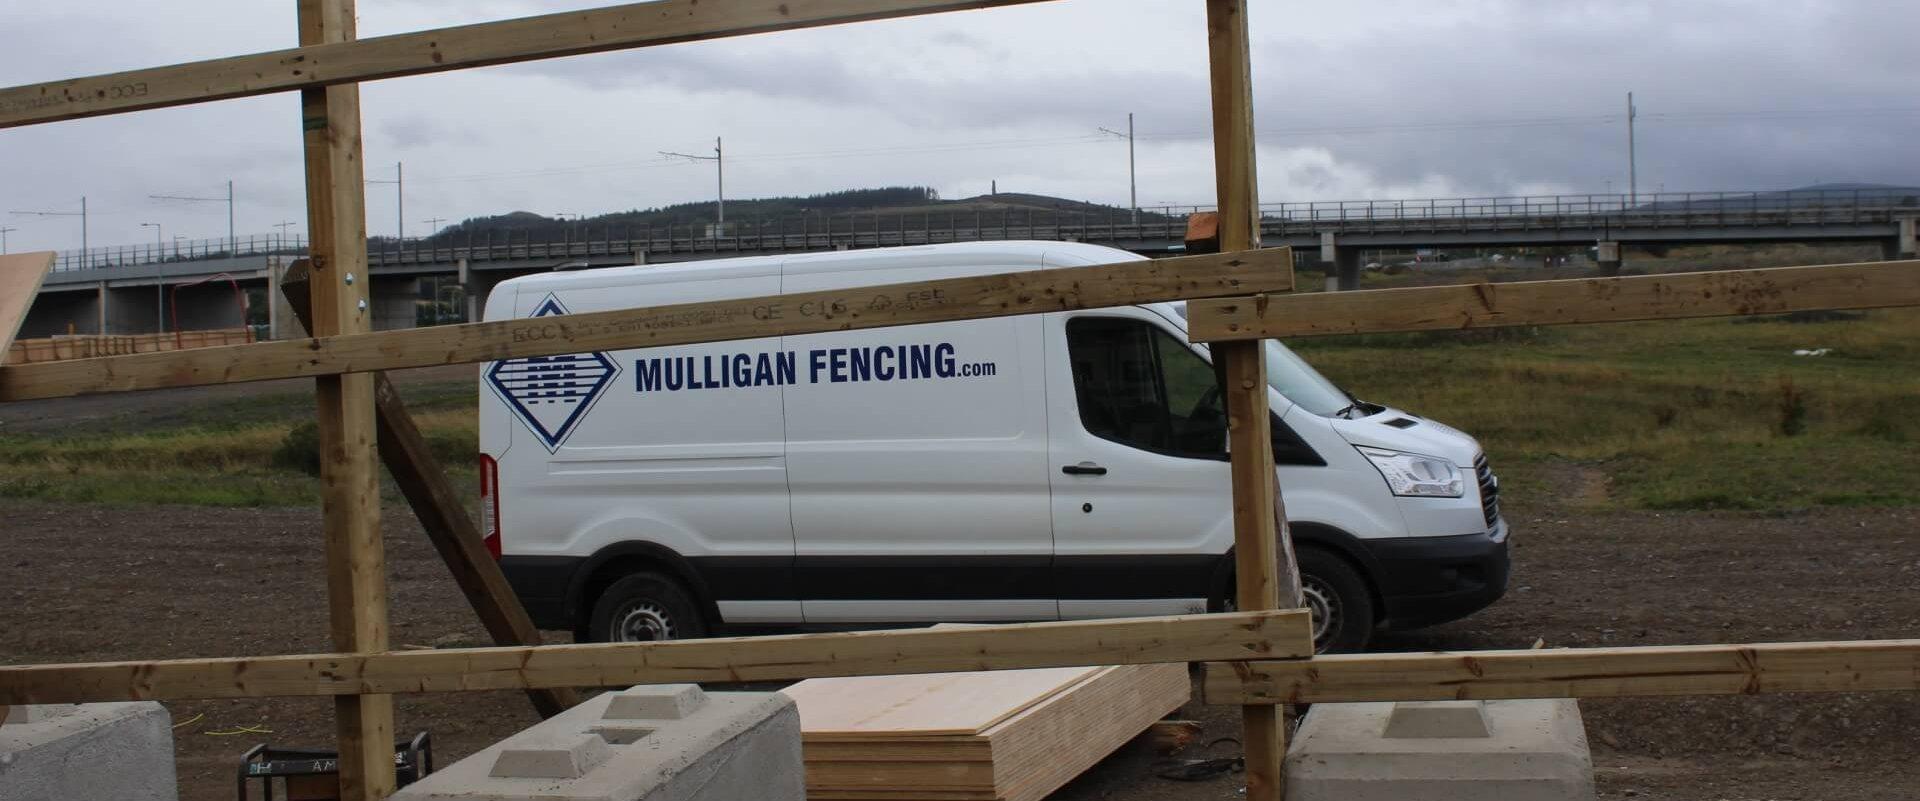 Mulligan Fencing Hoarding Fencing Cherrywood Dublin Ireland